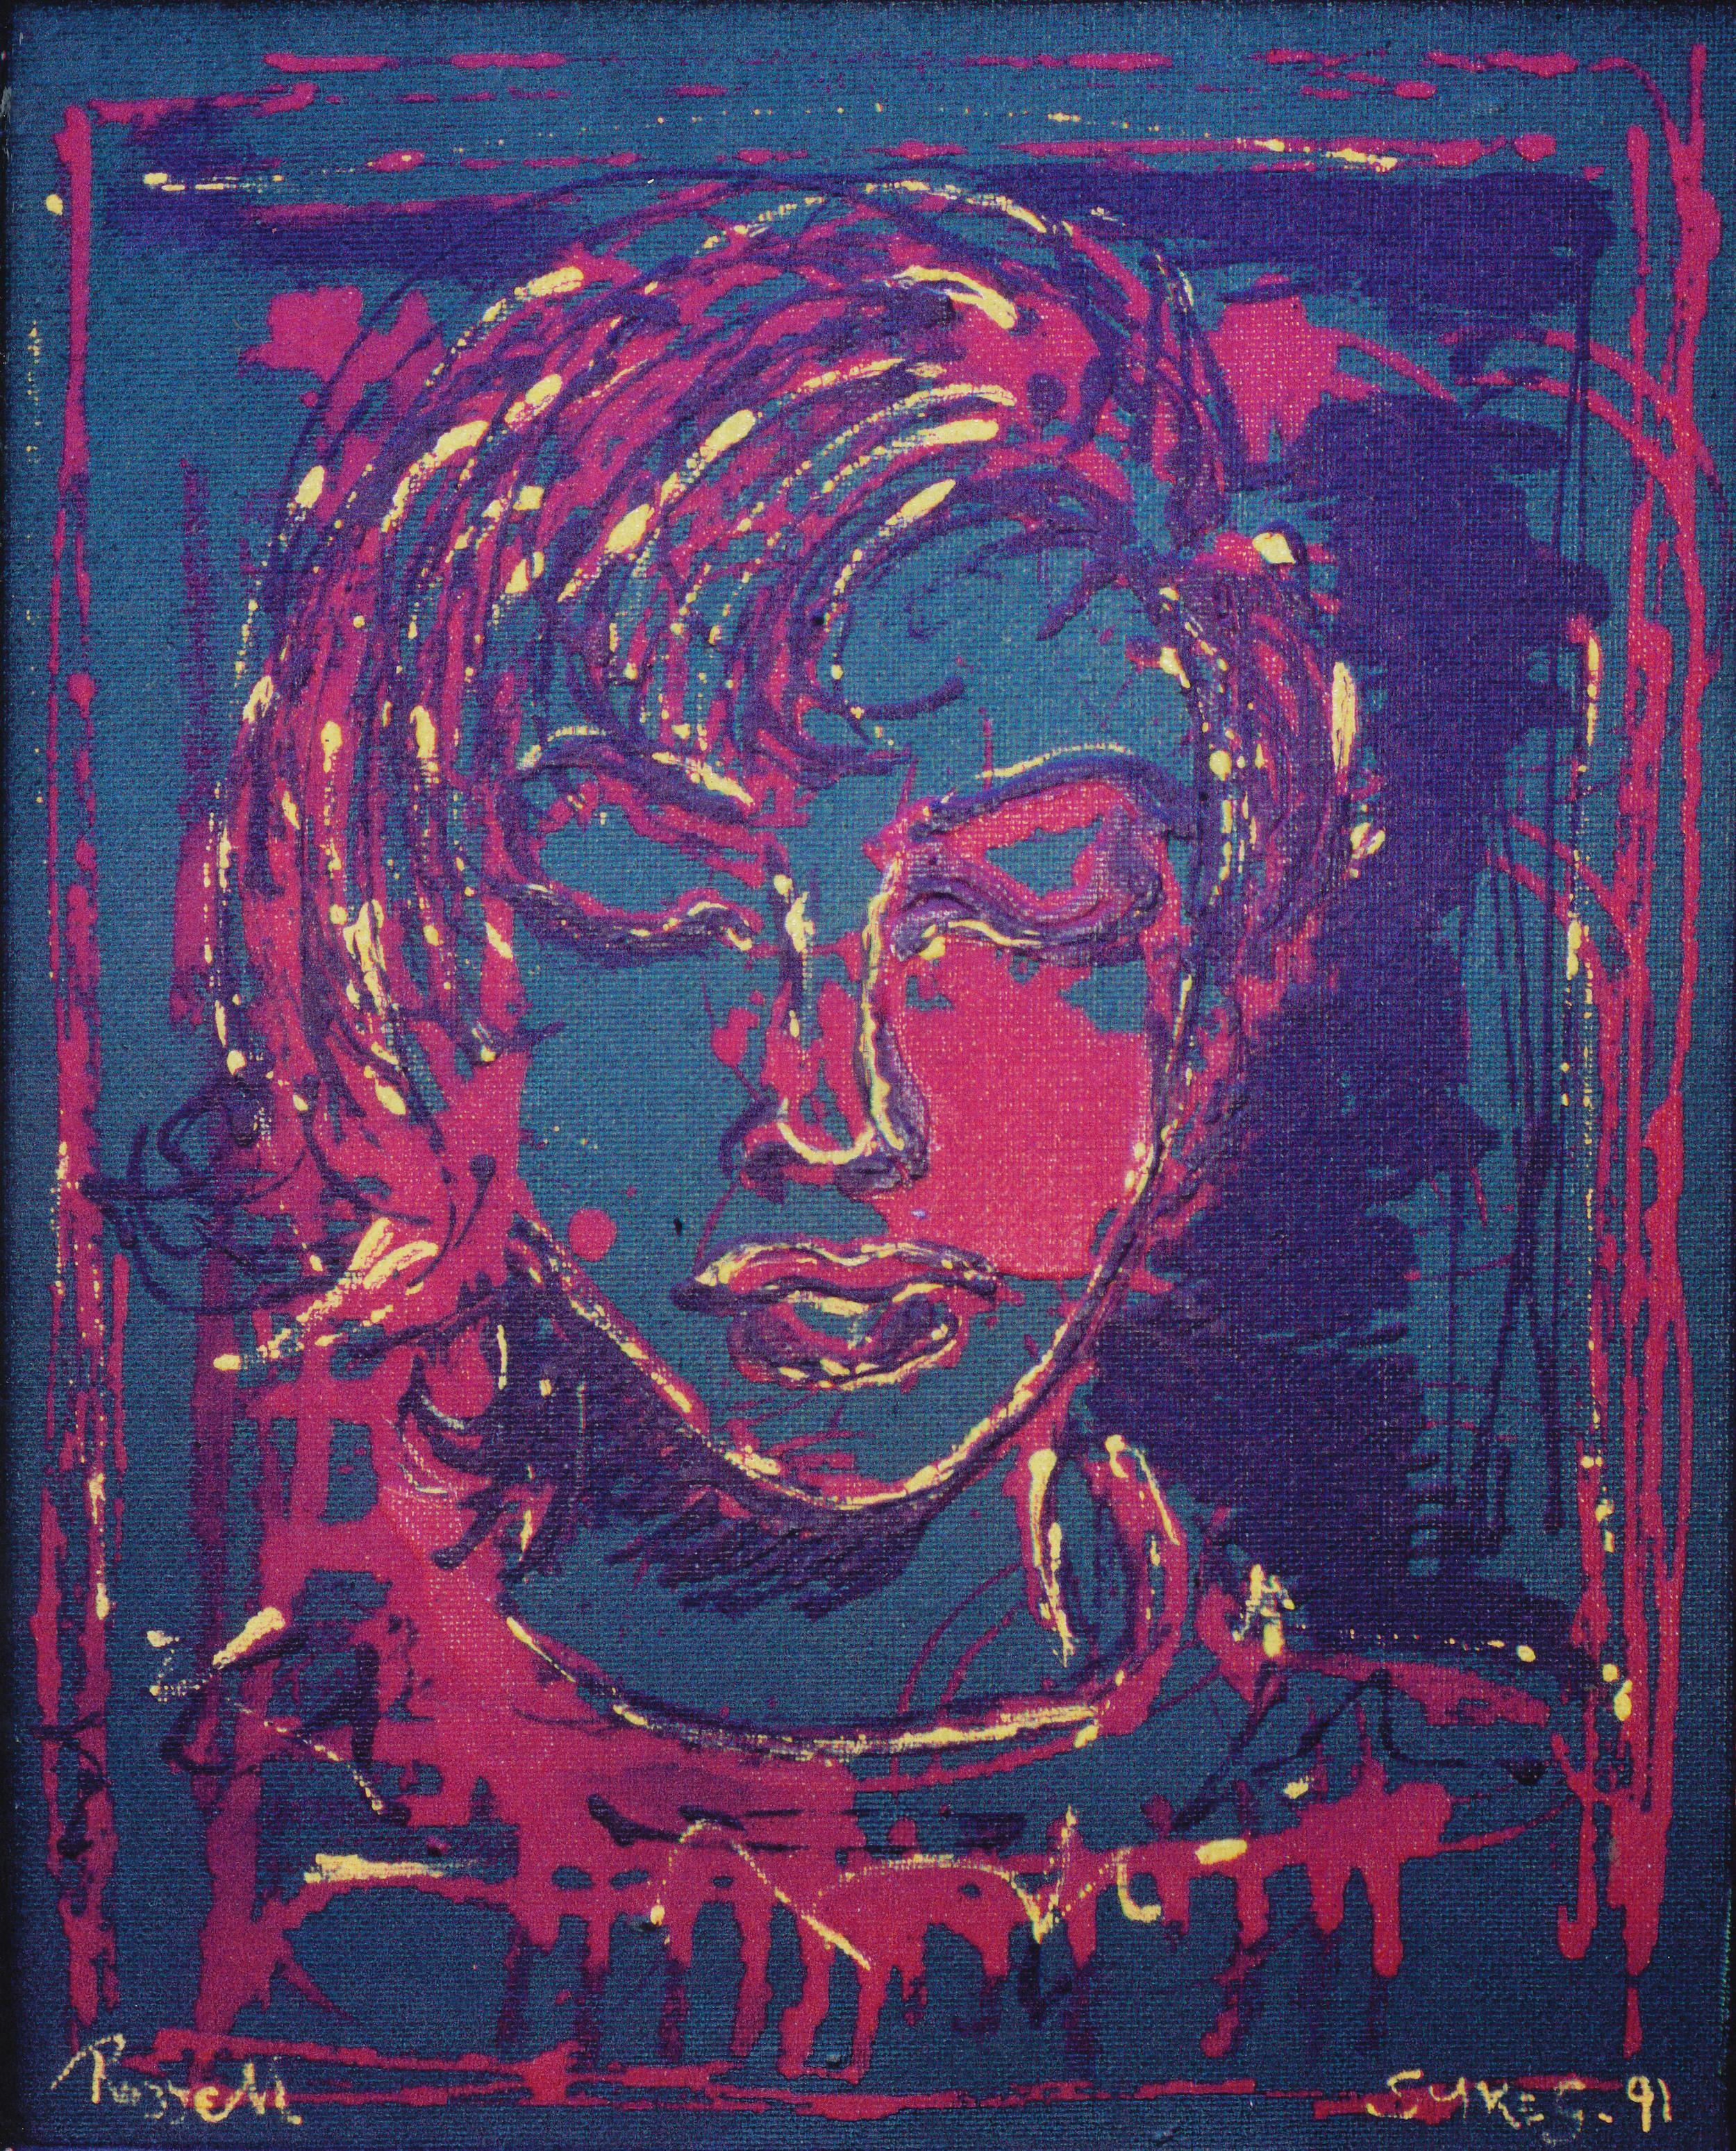 Head of Rozzell Jean Sykes- My Little Girl, 1991